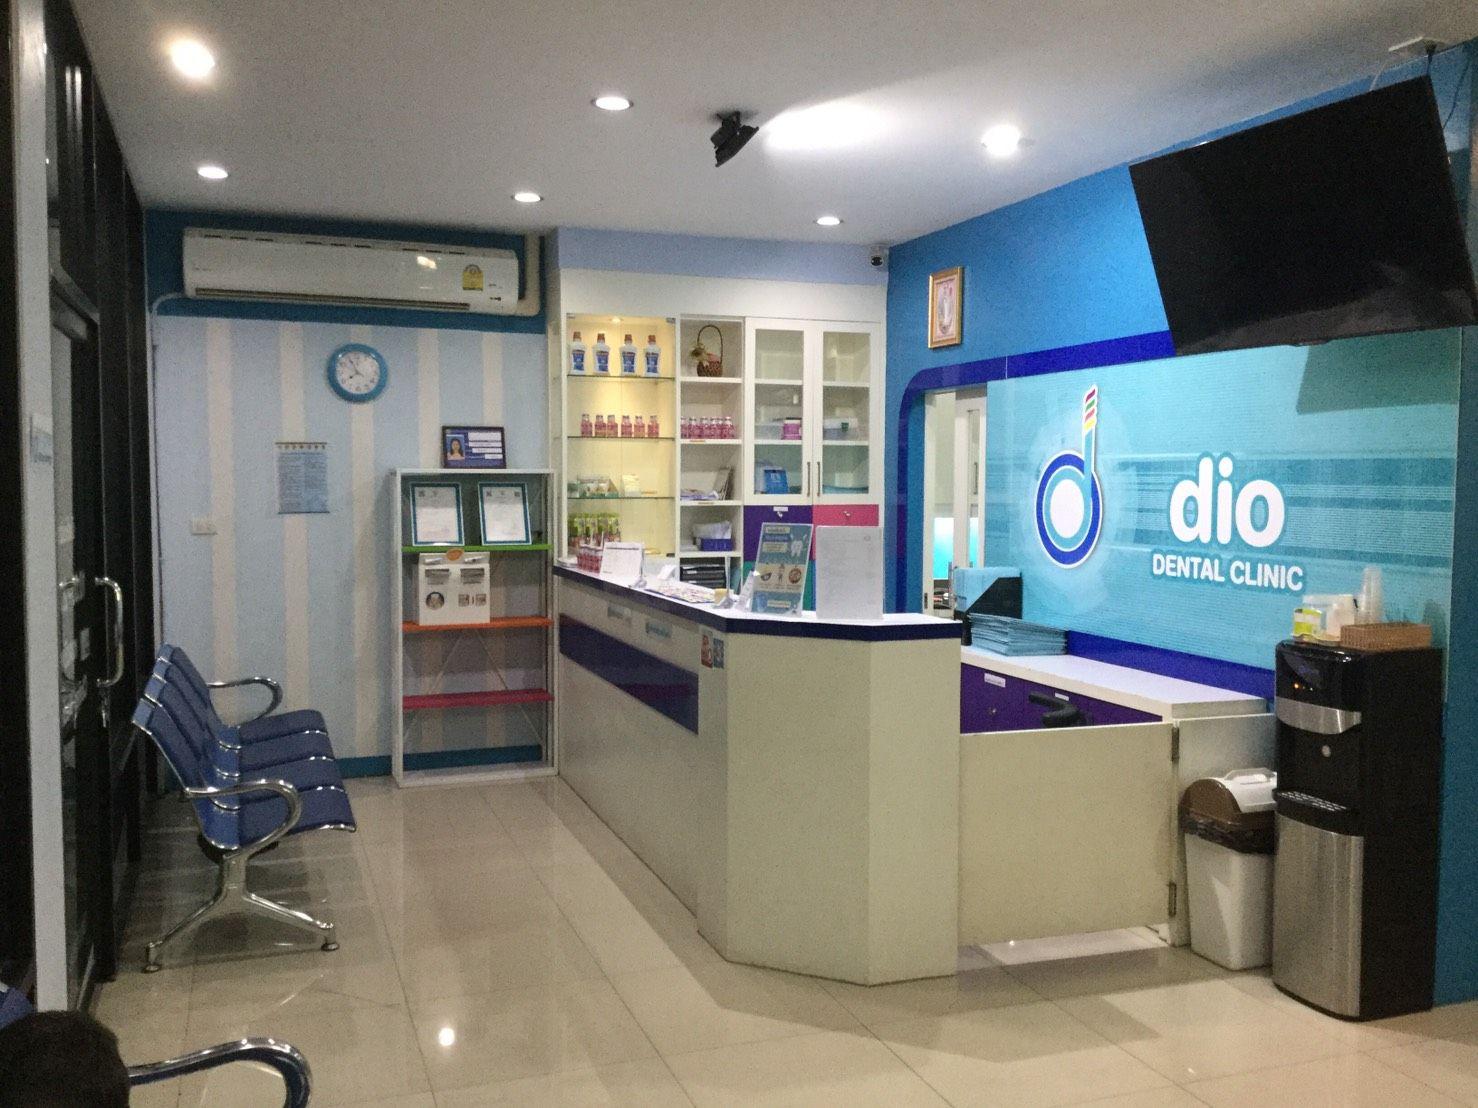 Dio Dental Clinic